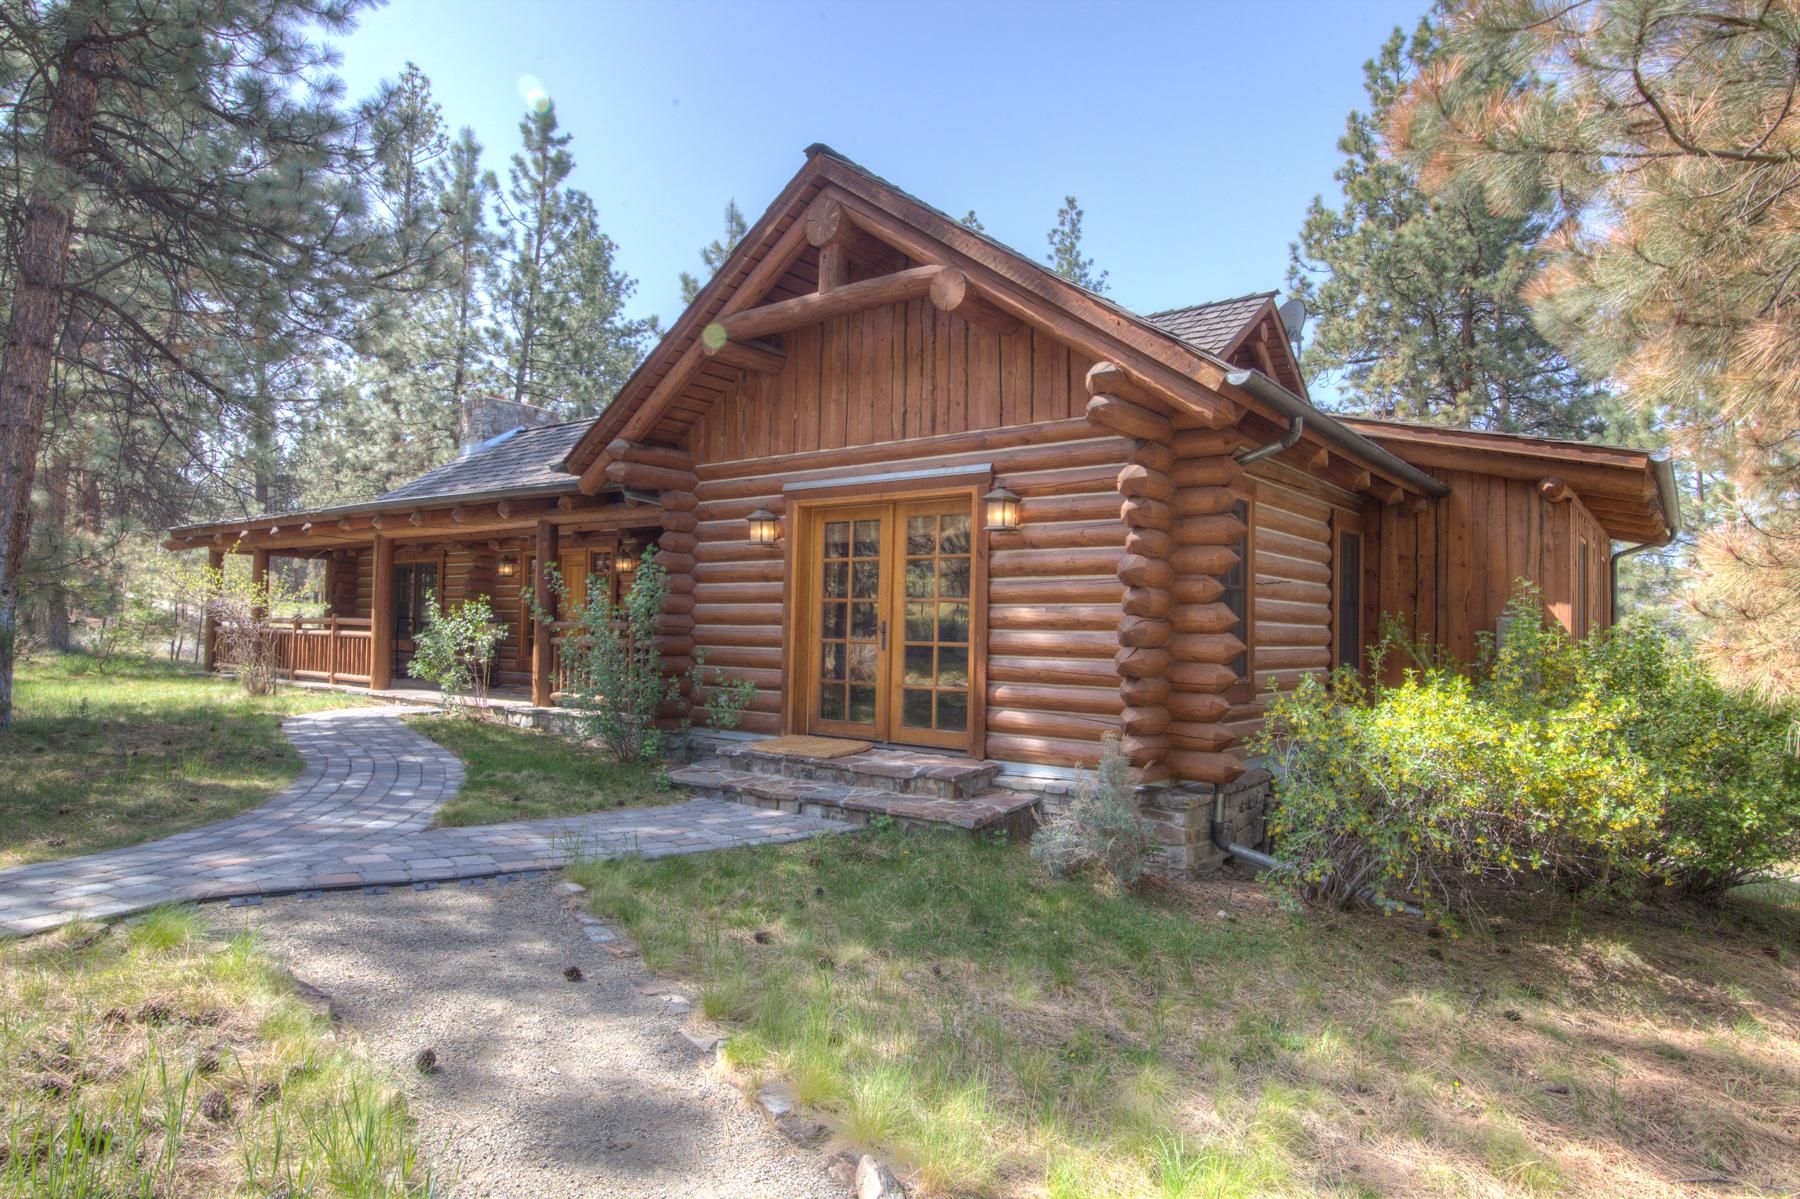 Single Family Home for Sale at Stock Farm Cabin 3 700 Pallo Trail Hamilton, Montana, 59840 United States